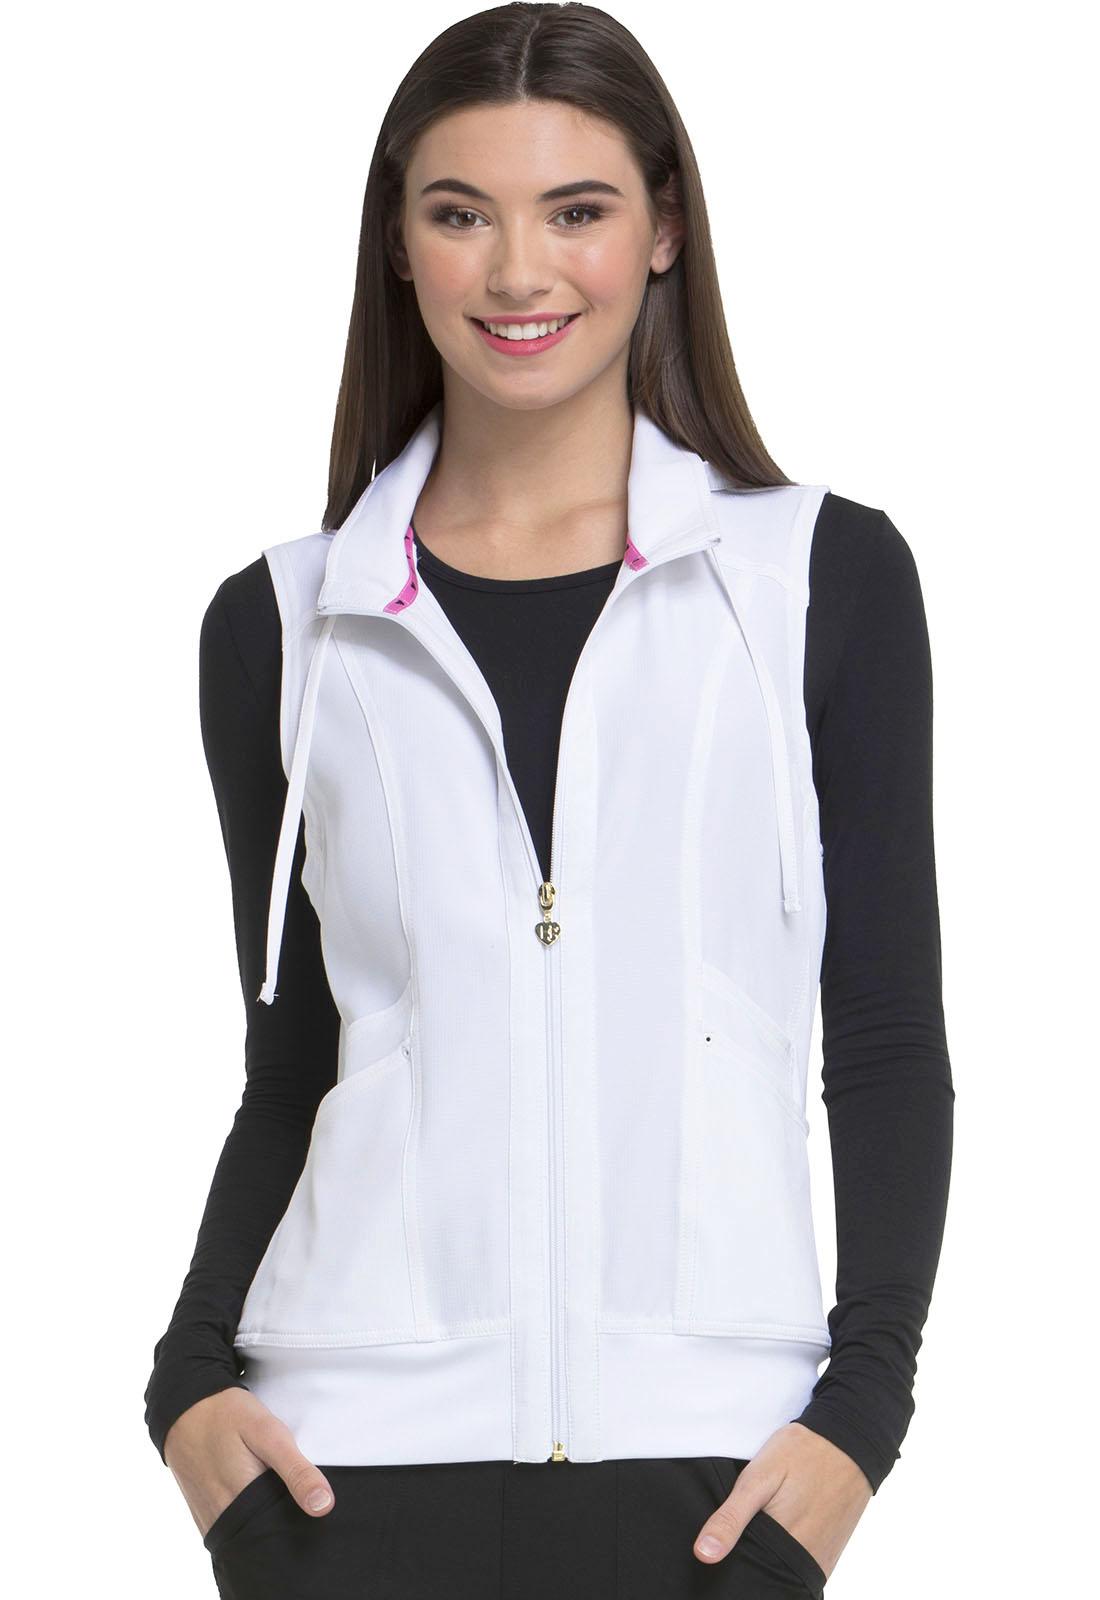 Womens Vest Bréal Discount Online Cheap Cheap Discount Authentic Outlet Where To Buy Cheap Sale Footlocker Finishline jcVfS5